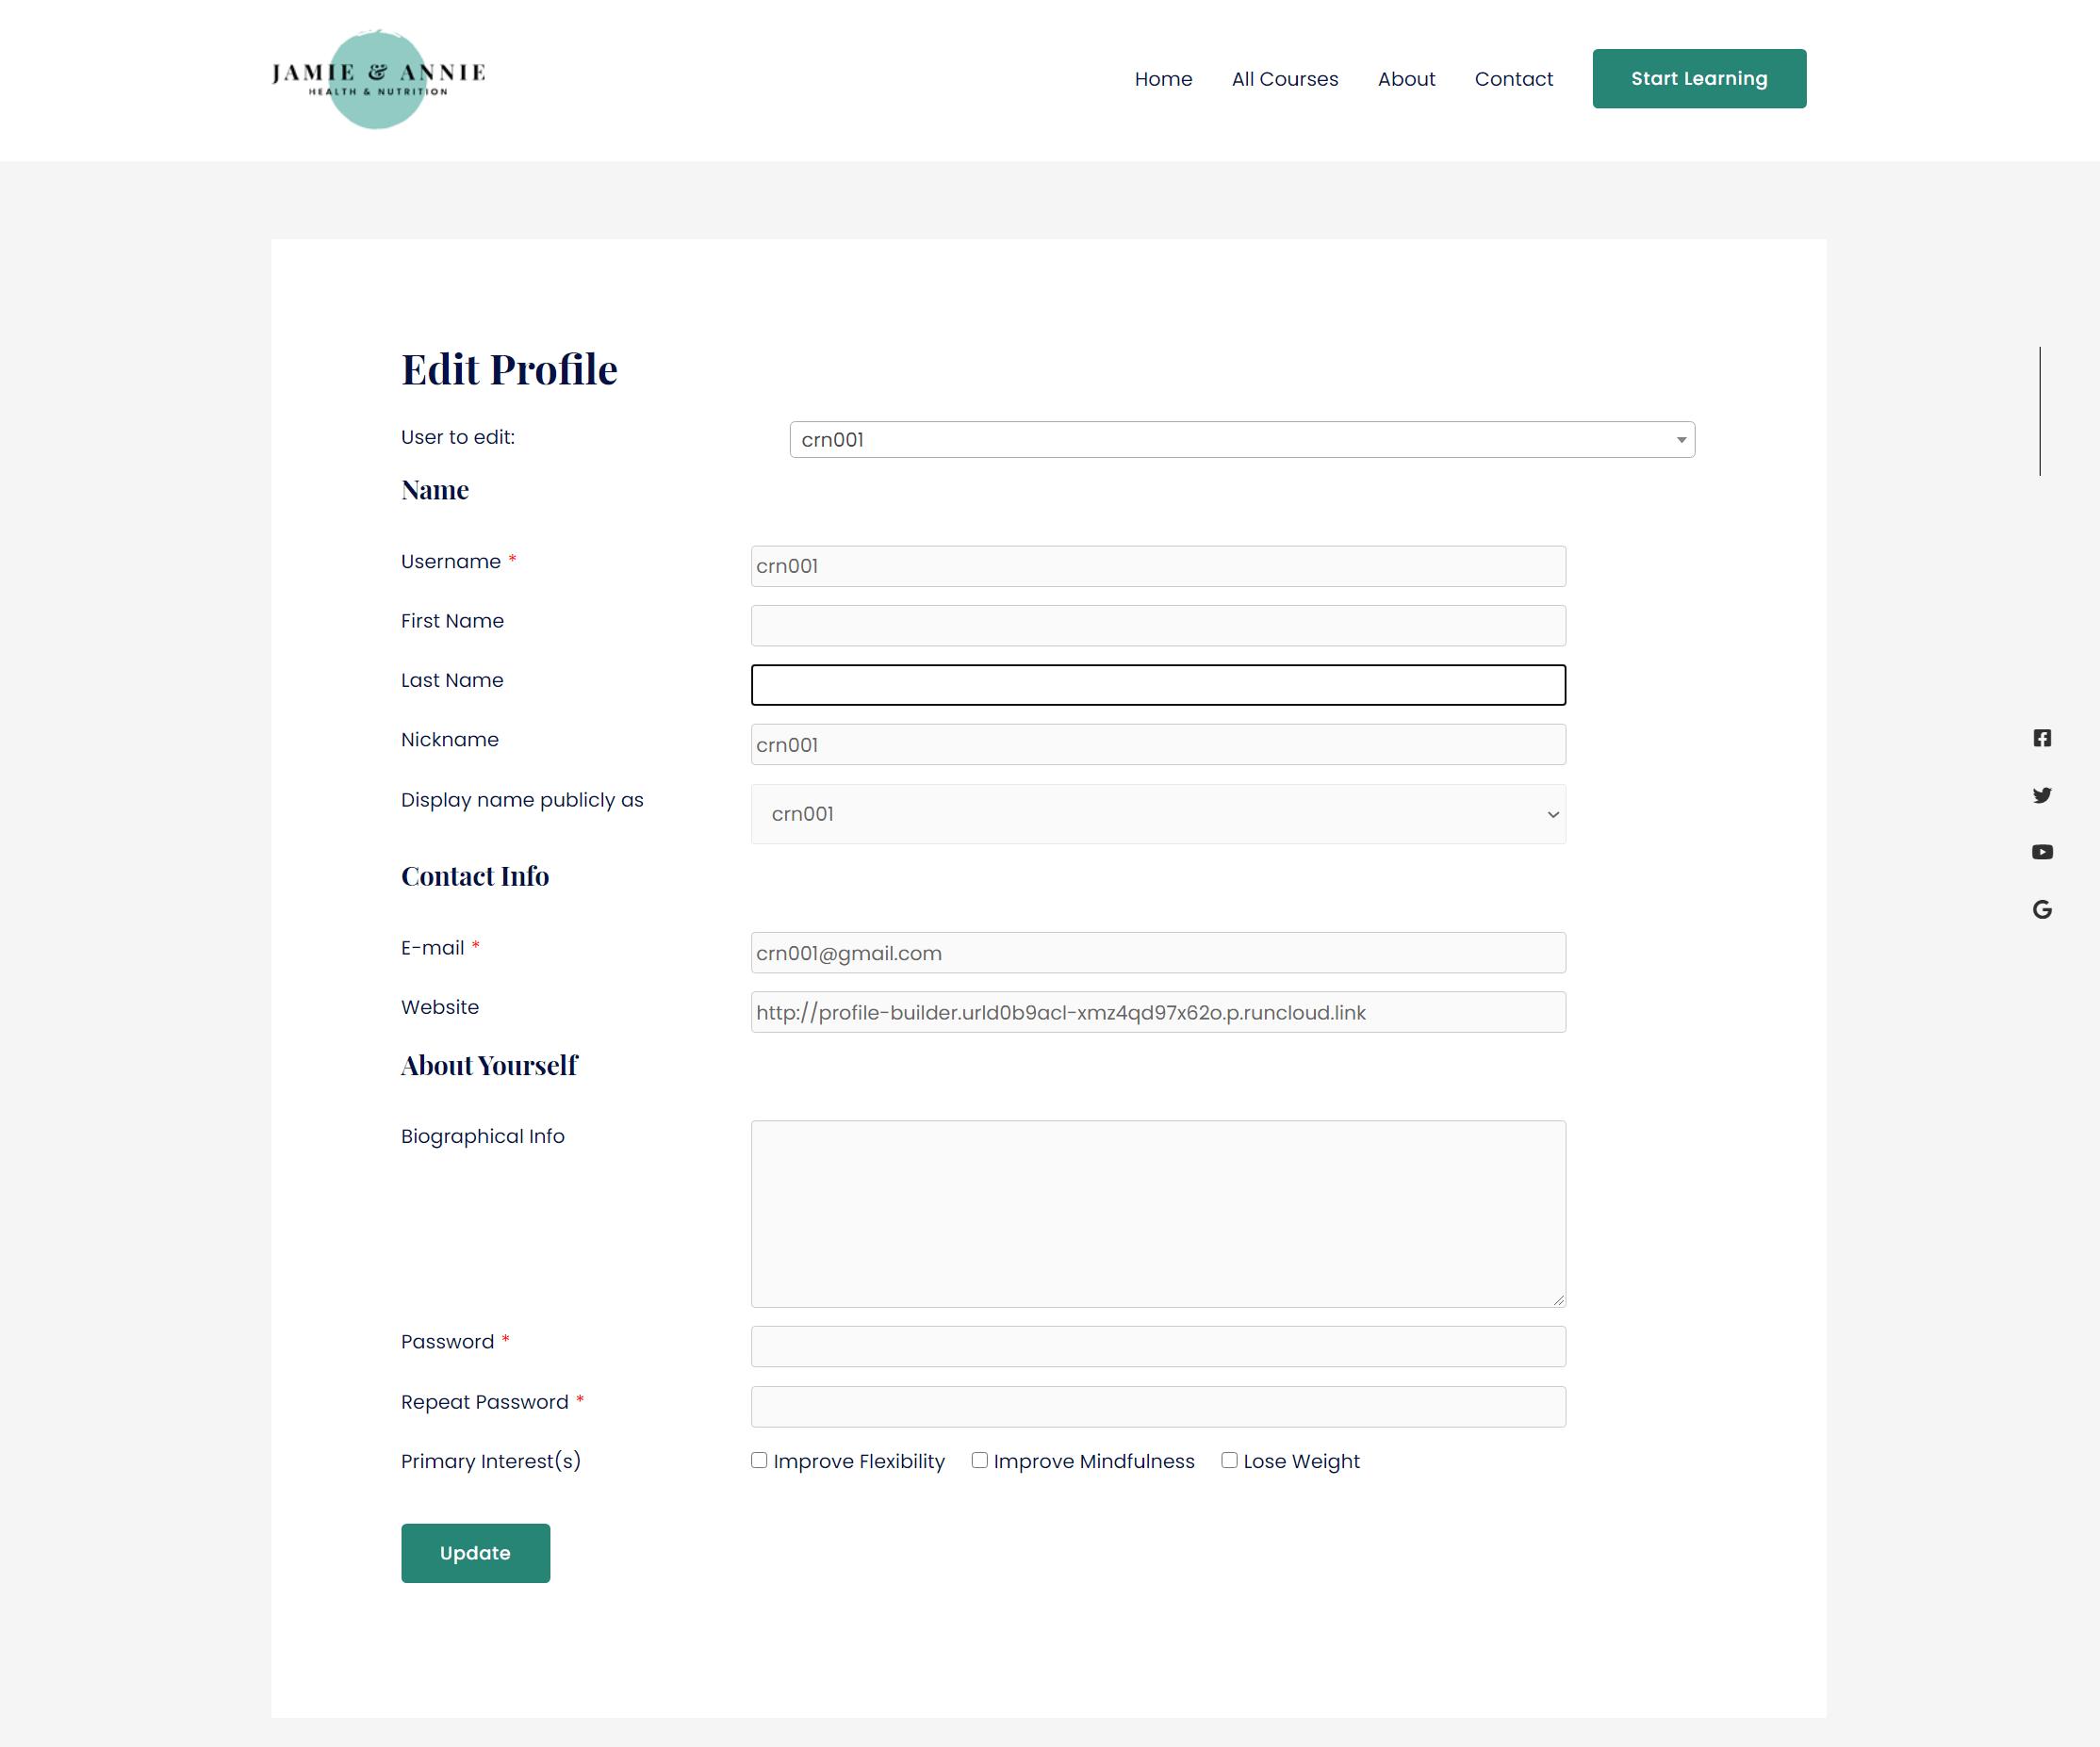 Profile Builder edit profile field